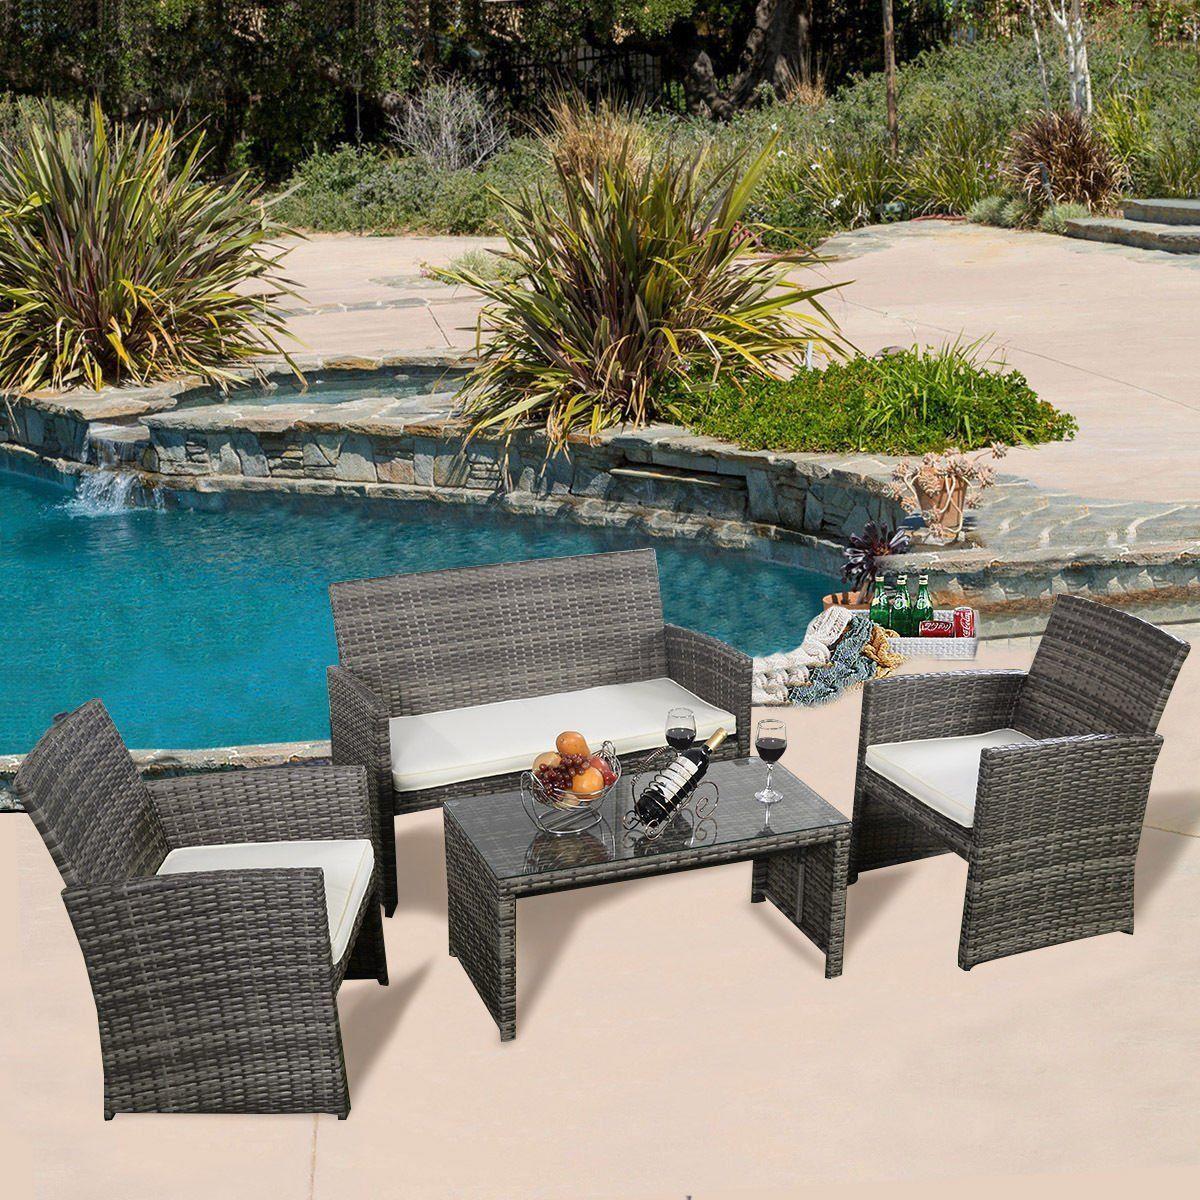 Amazon Com Ghp Outdoor Garden Patio 4 Piece Cushioned 400 x 300